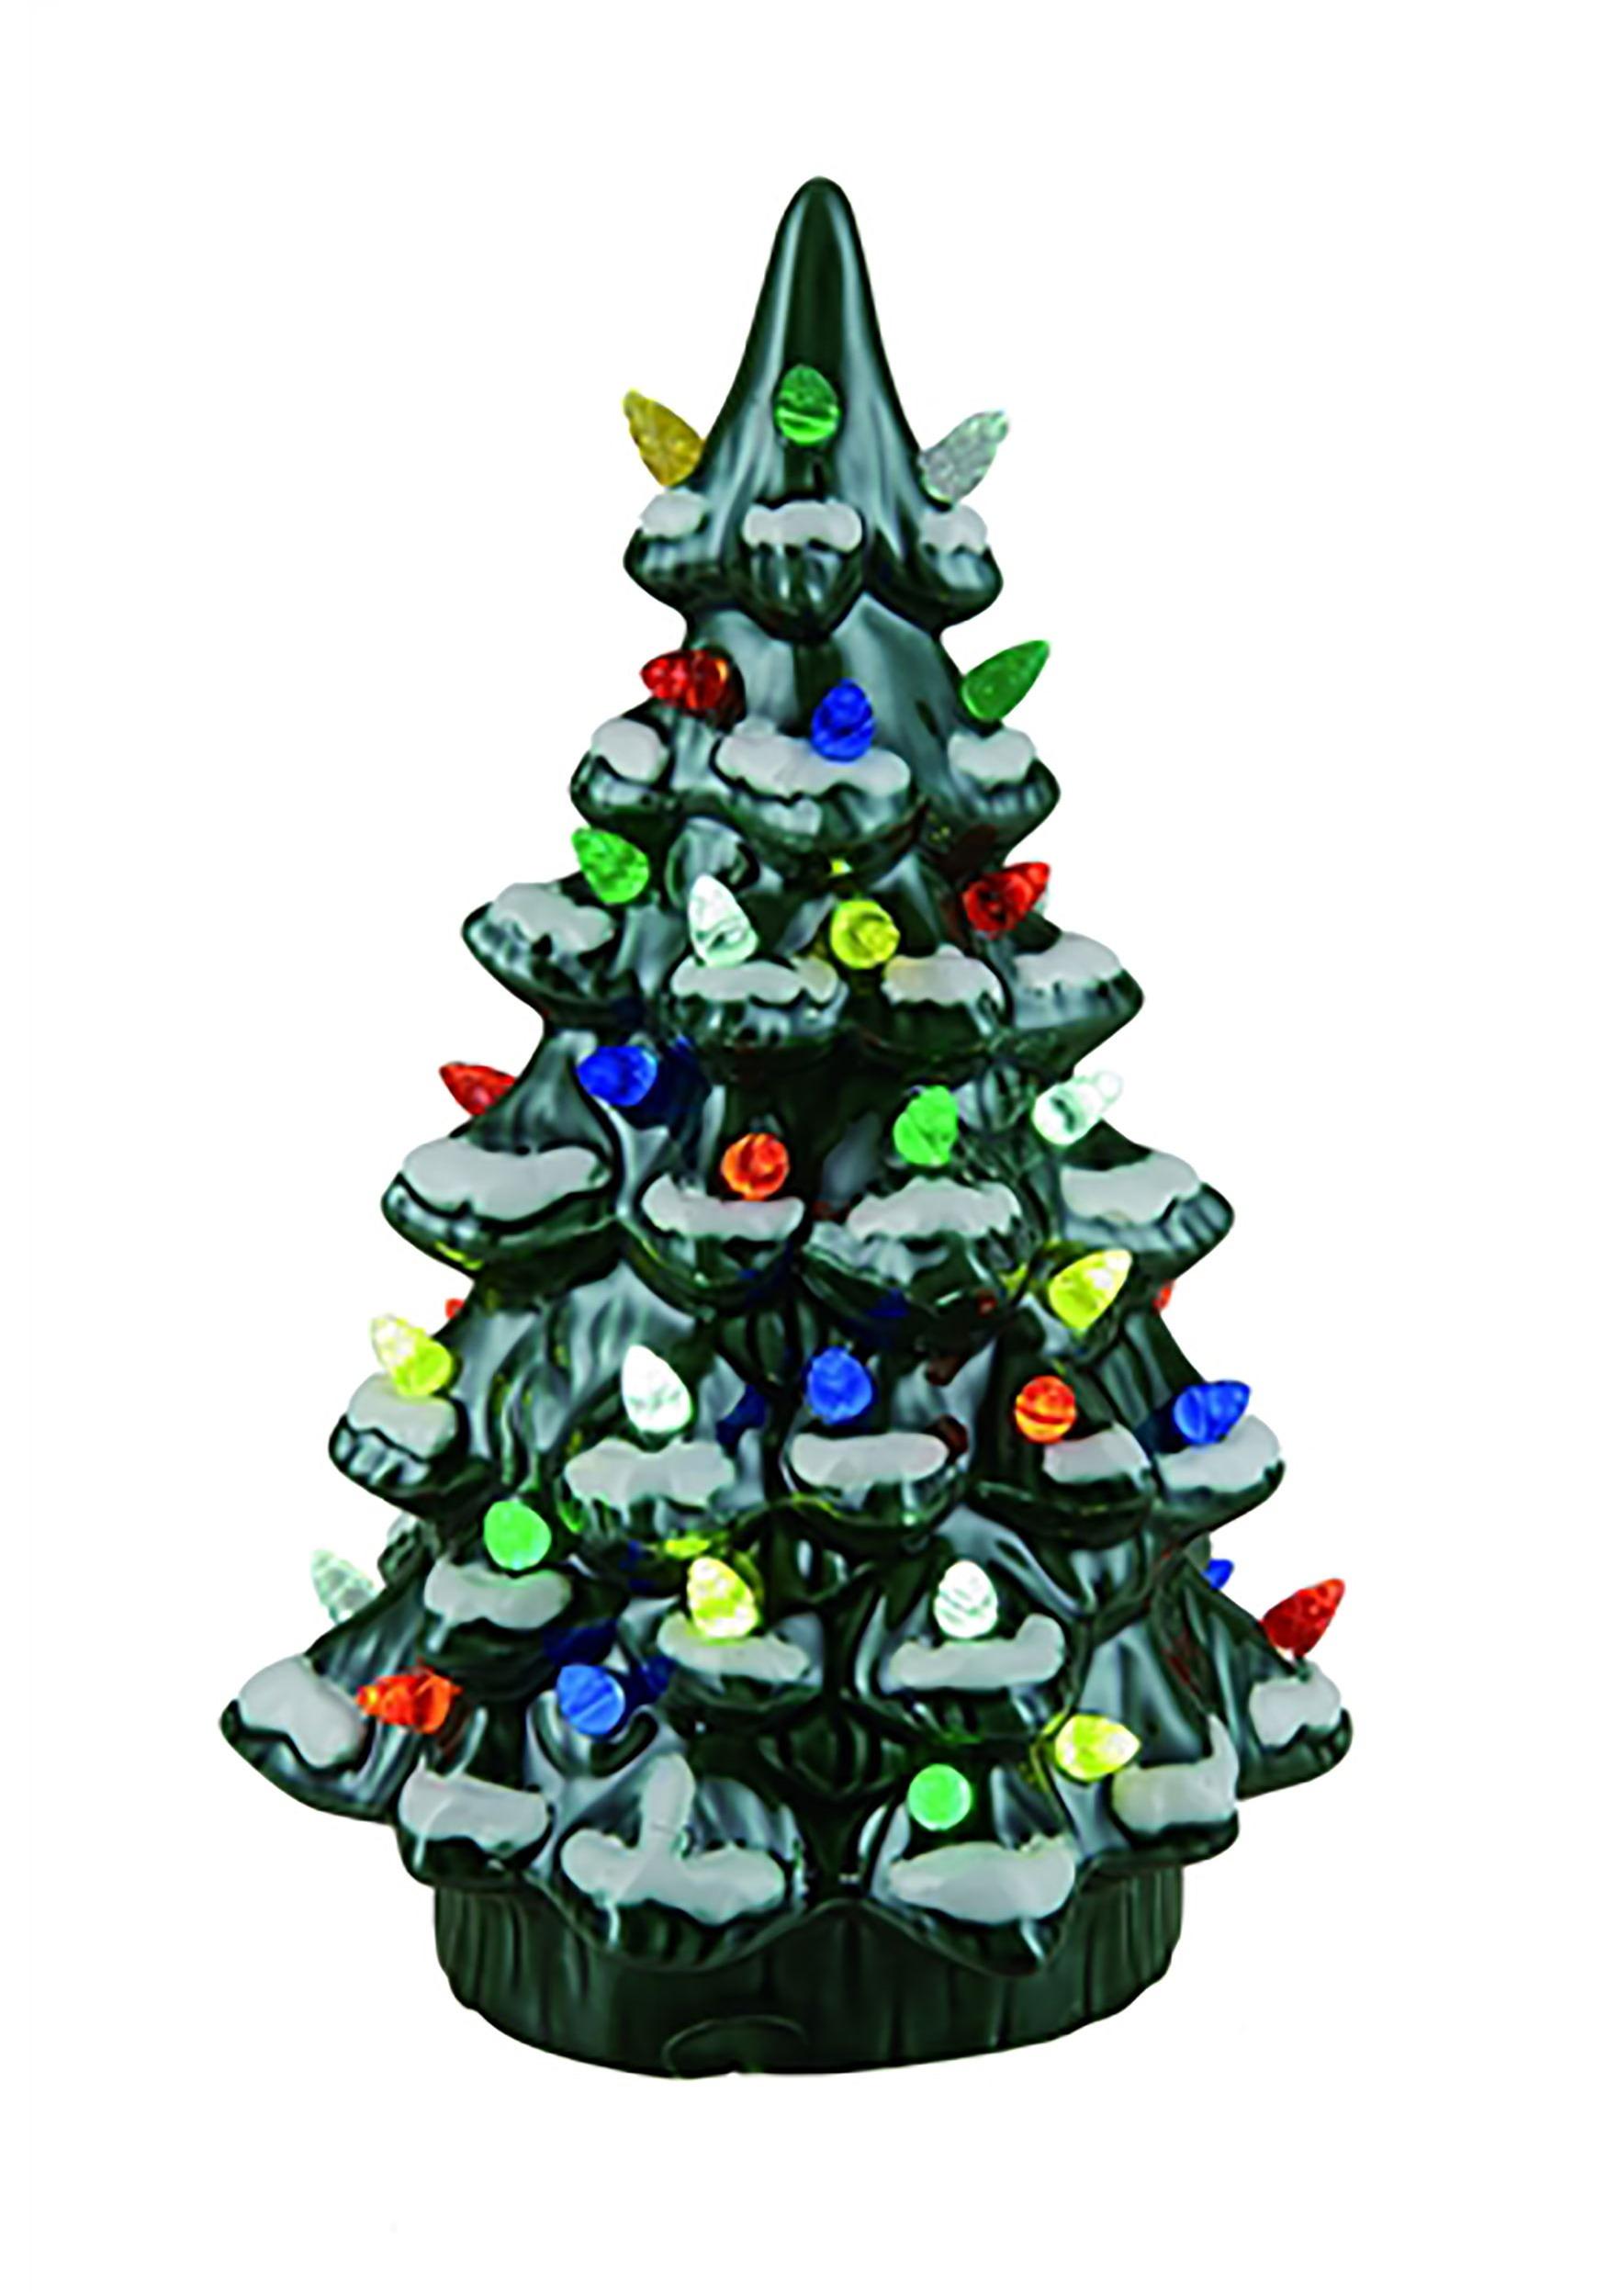 ceramic 1175 light up nostalgic tree - Ceramic Light Up Christmas Tree